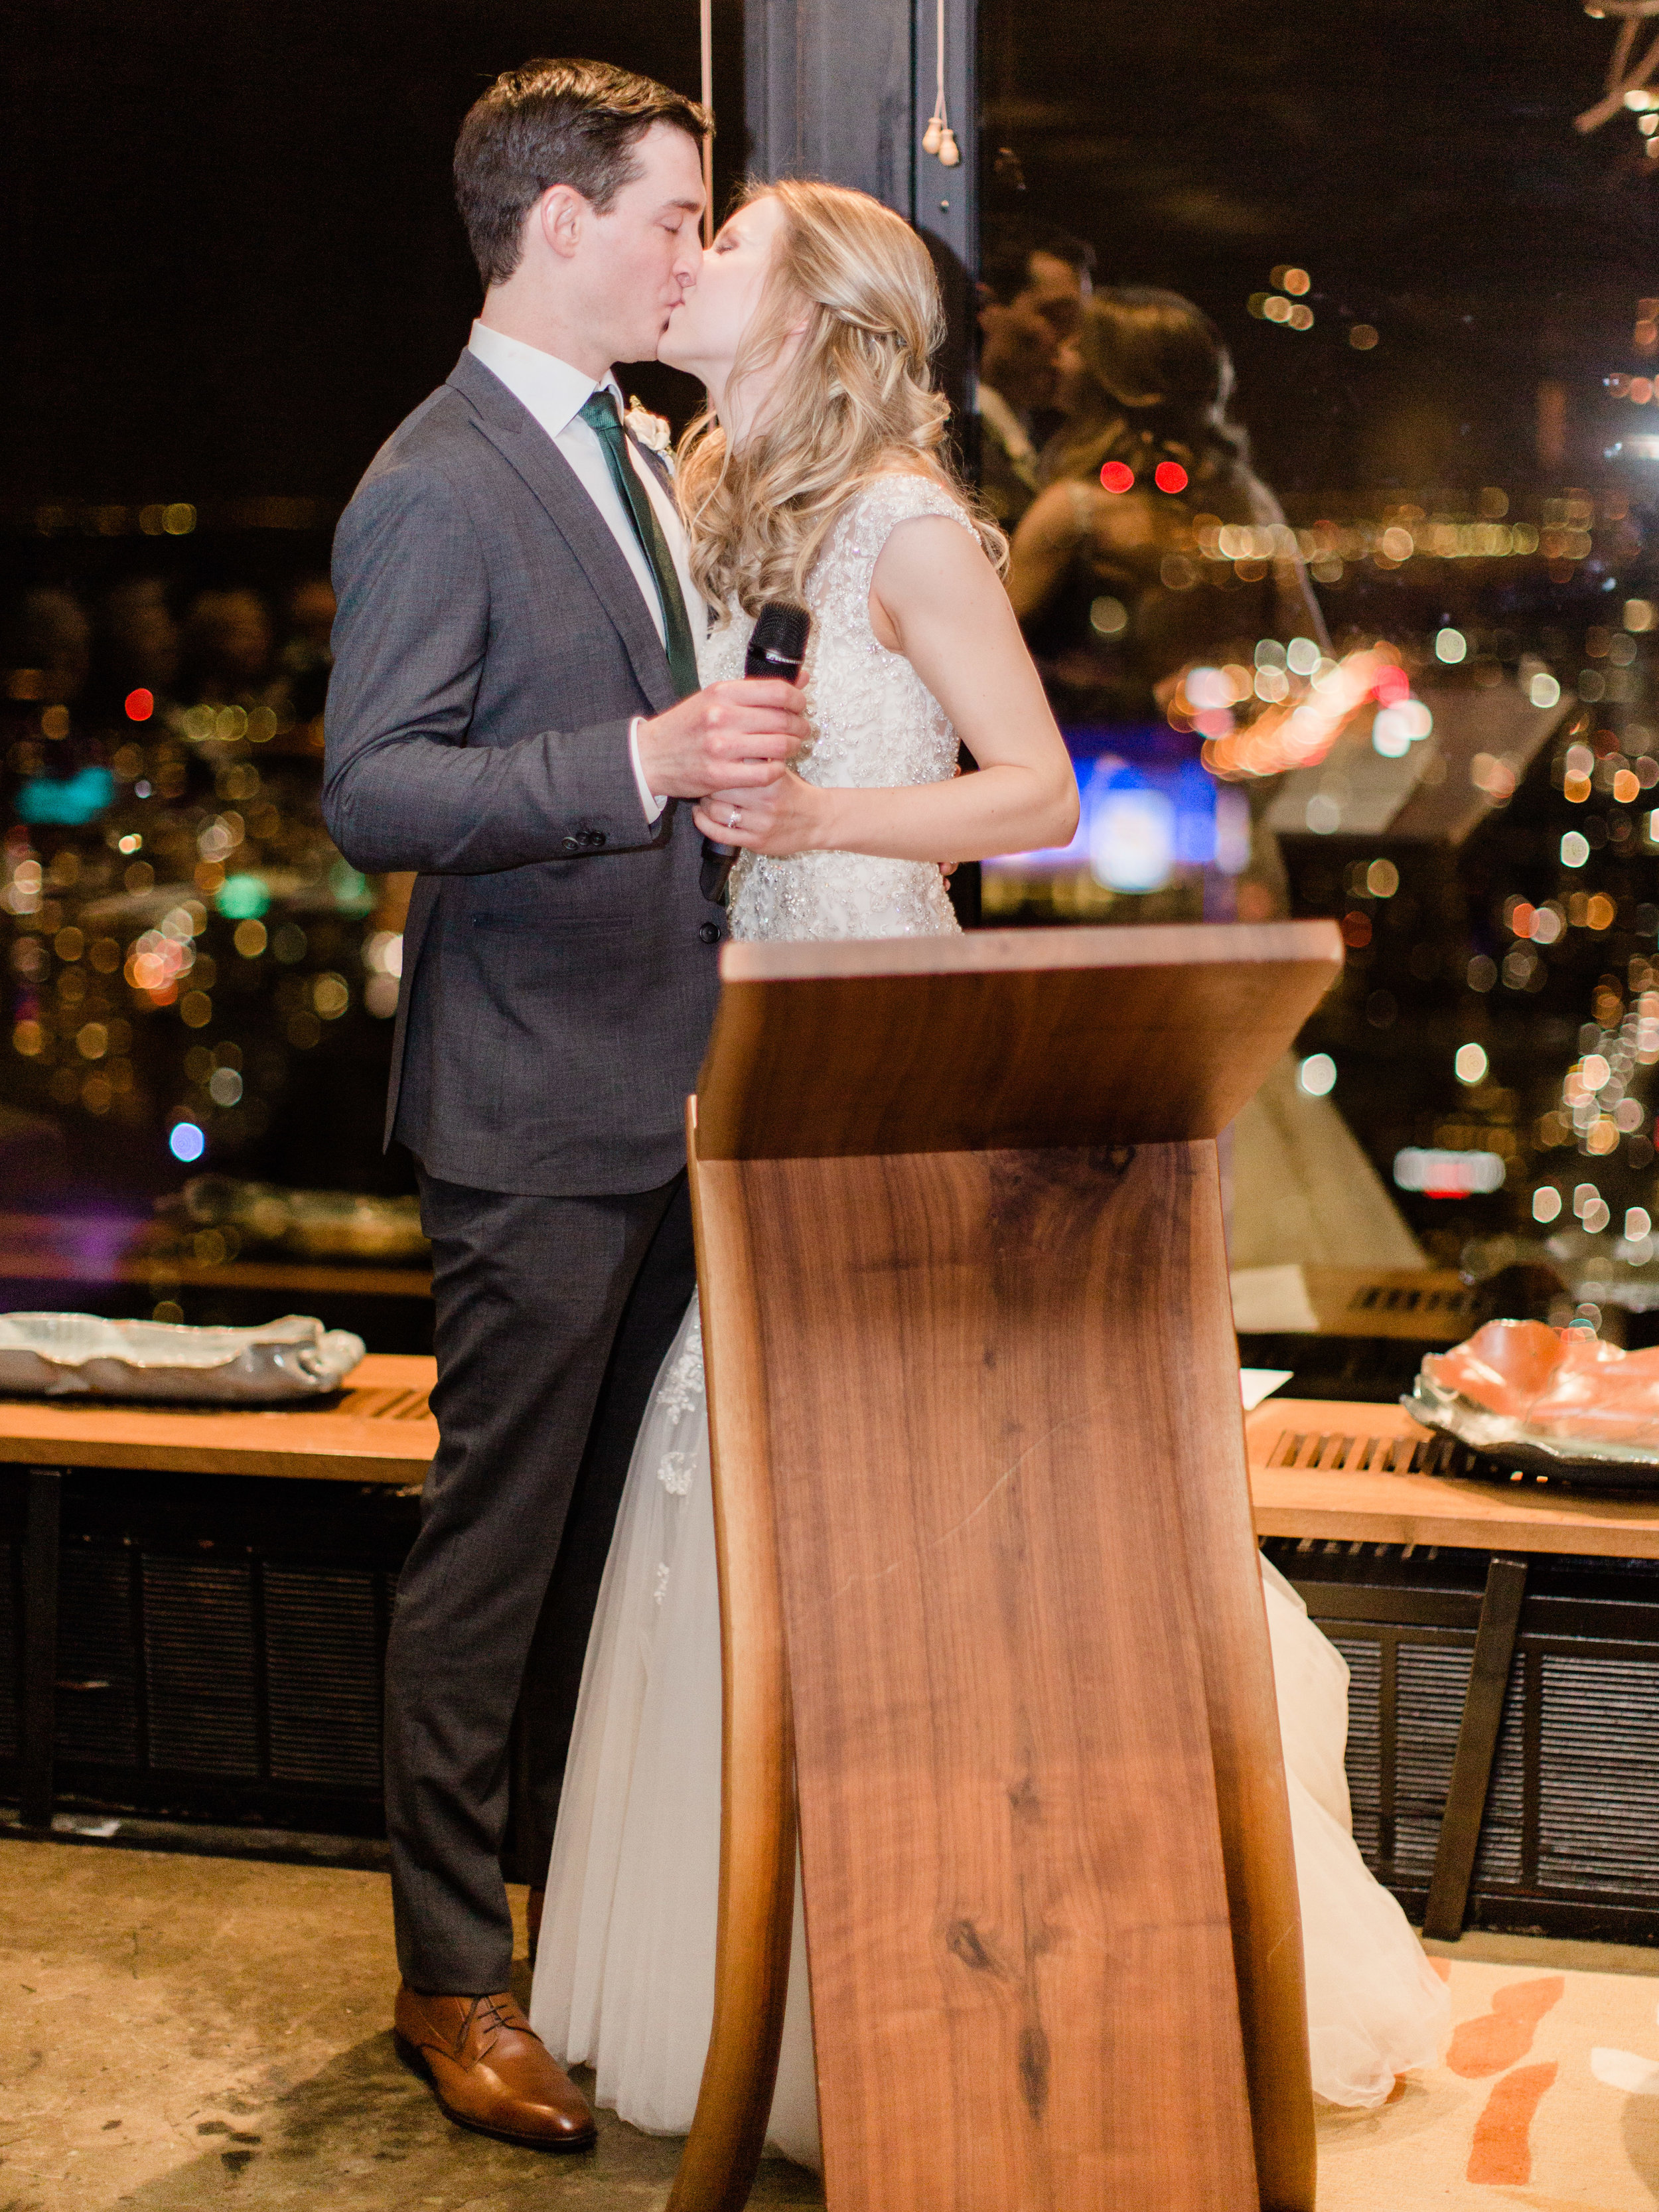 Toronto-wedding-photographer-downtown-winter-wedding-intimate-restaurant-canoe170.jpg